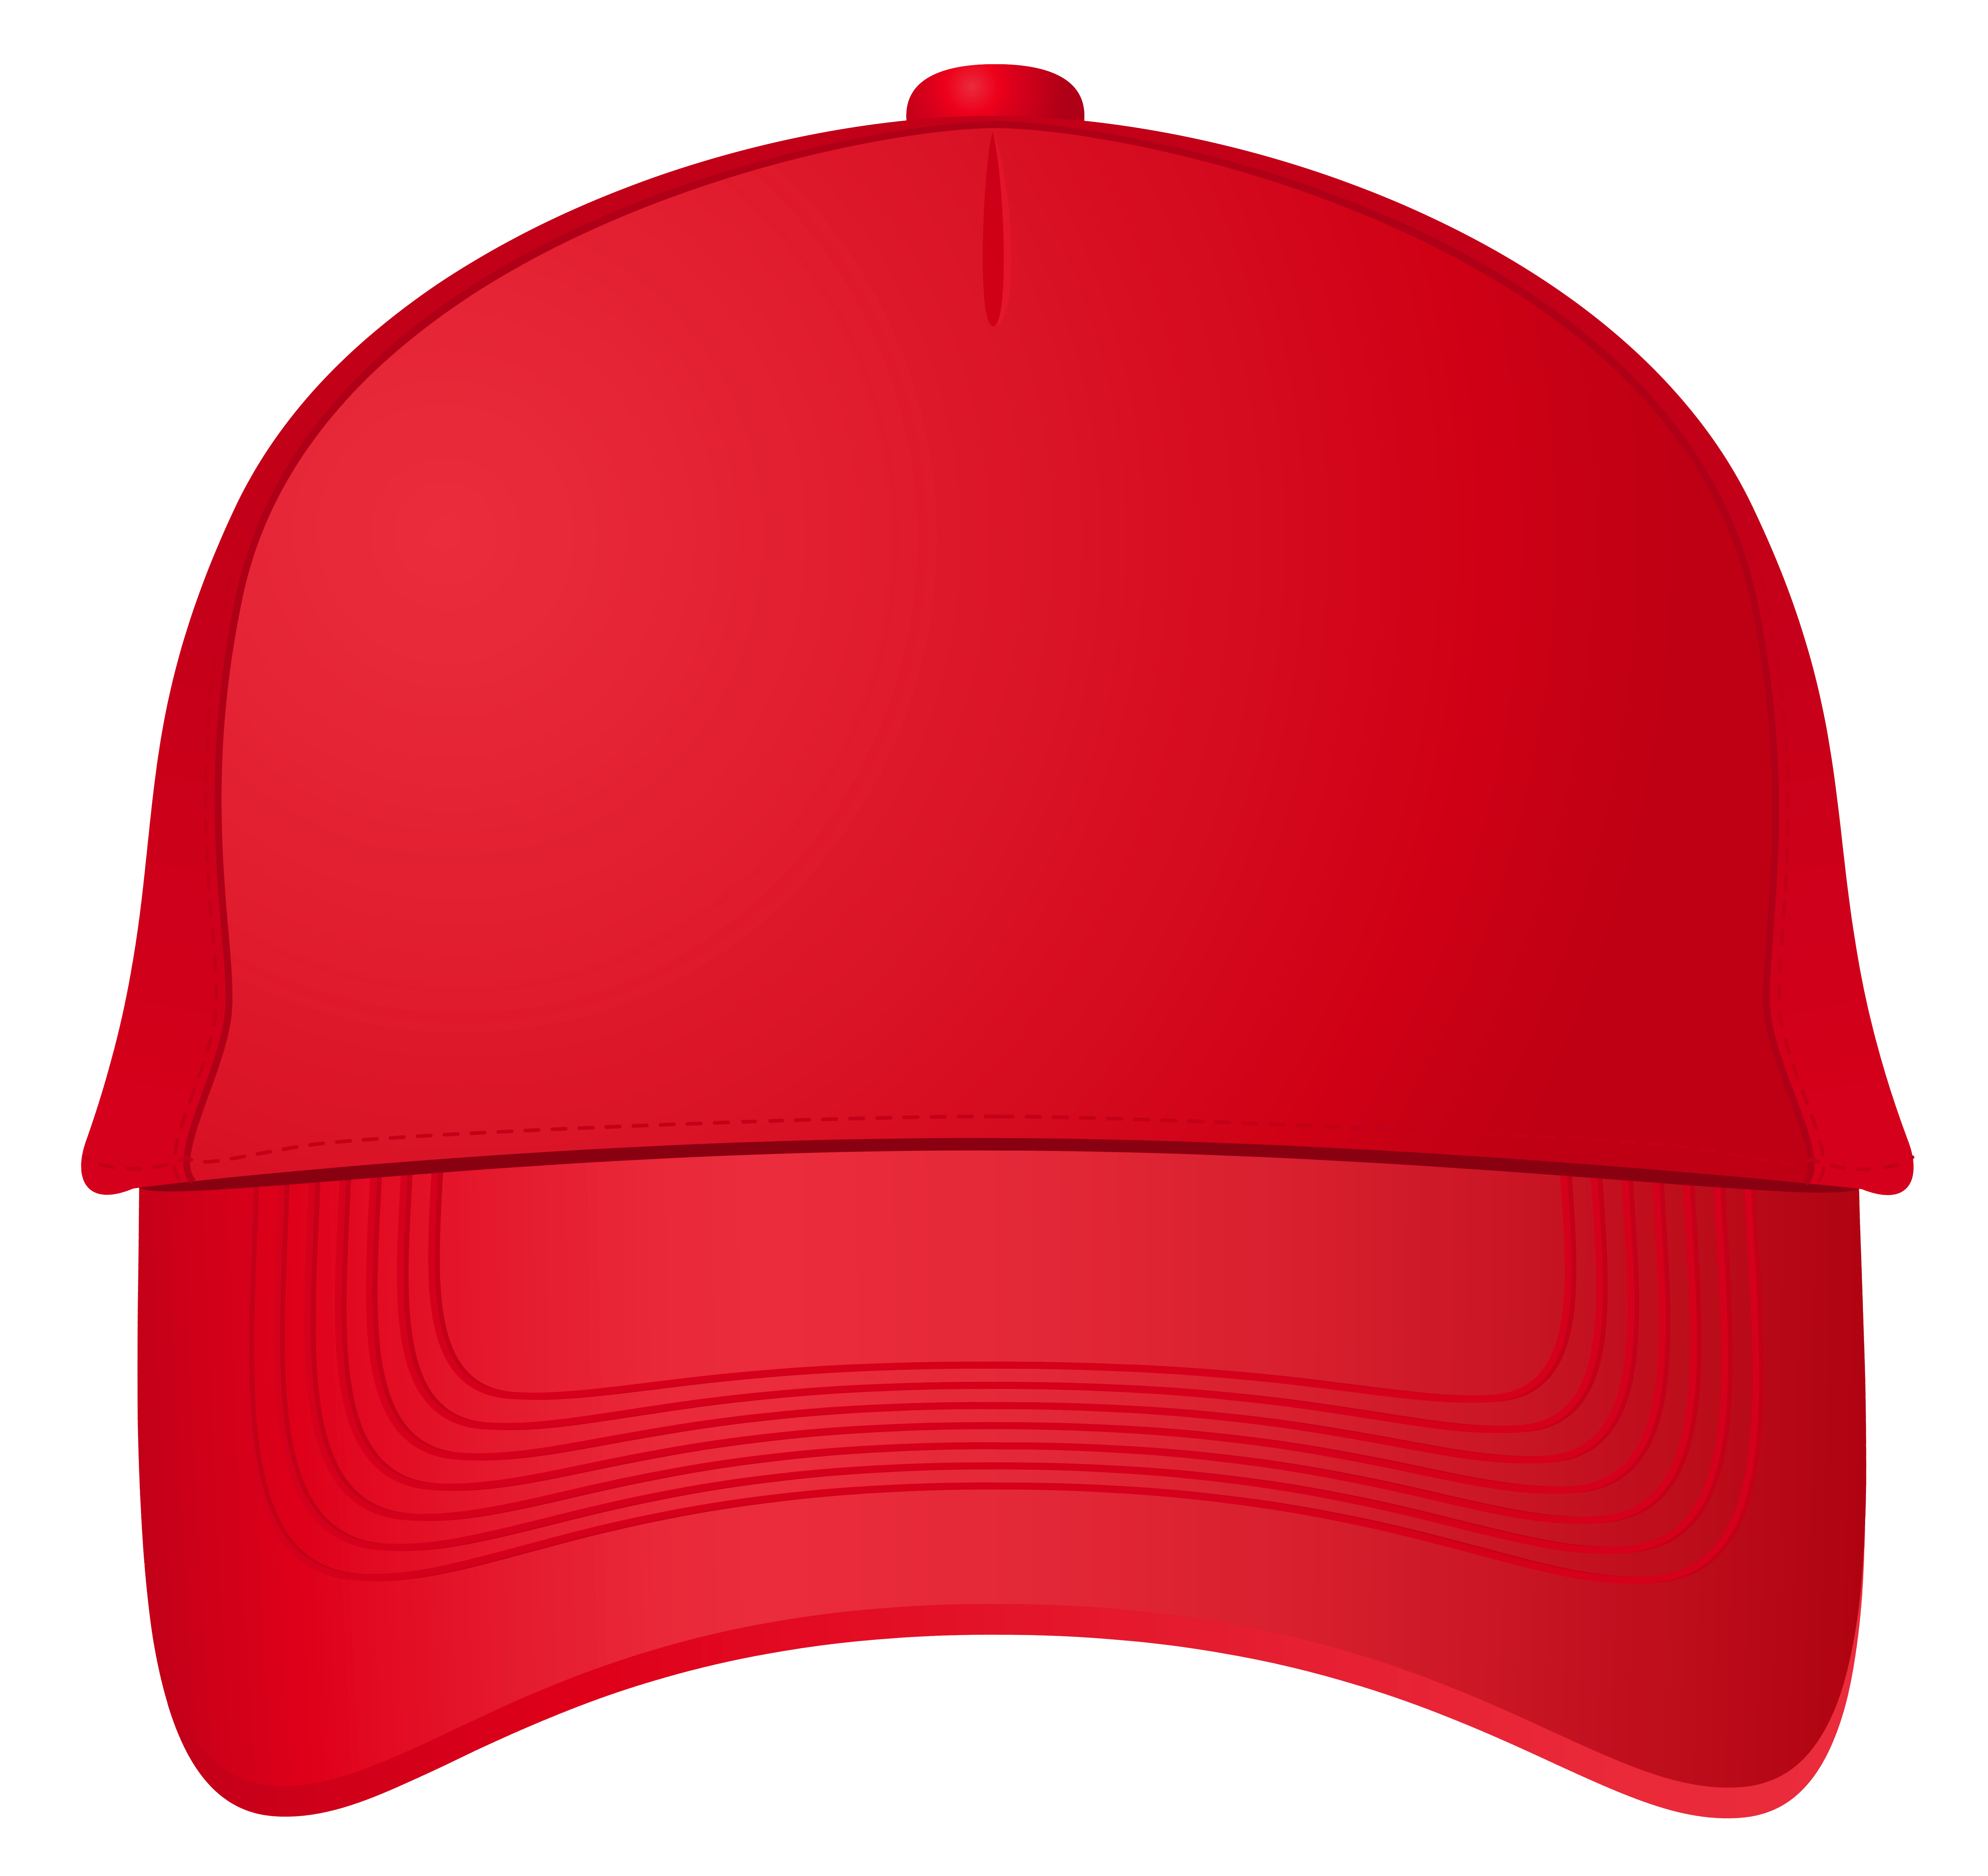 Baseball cap clipart front.